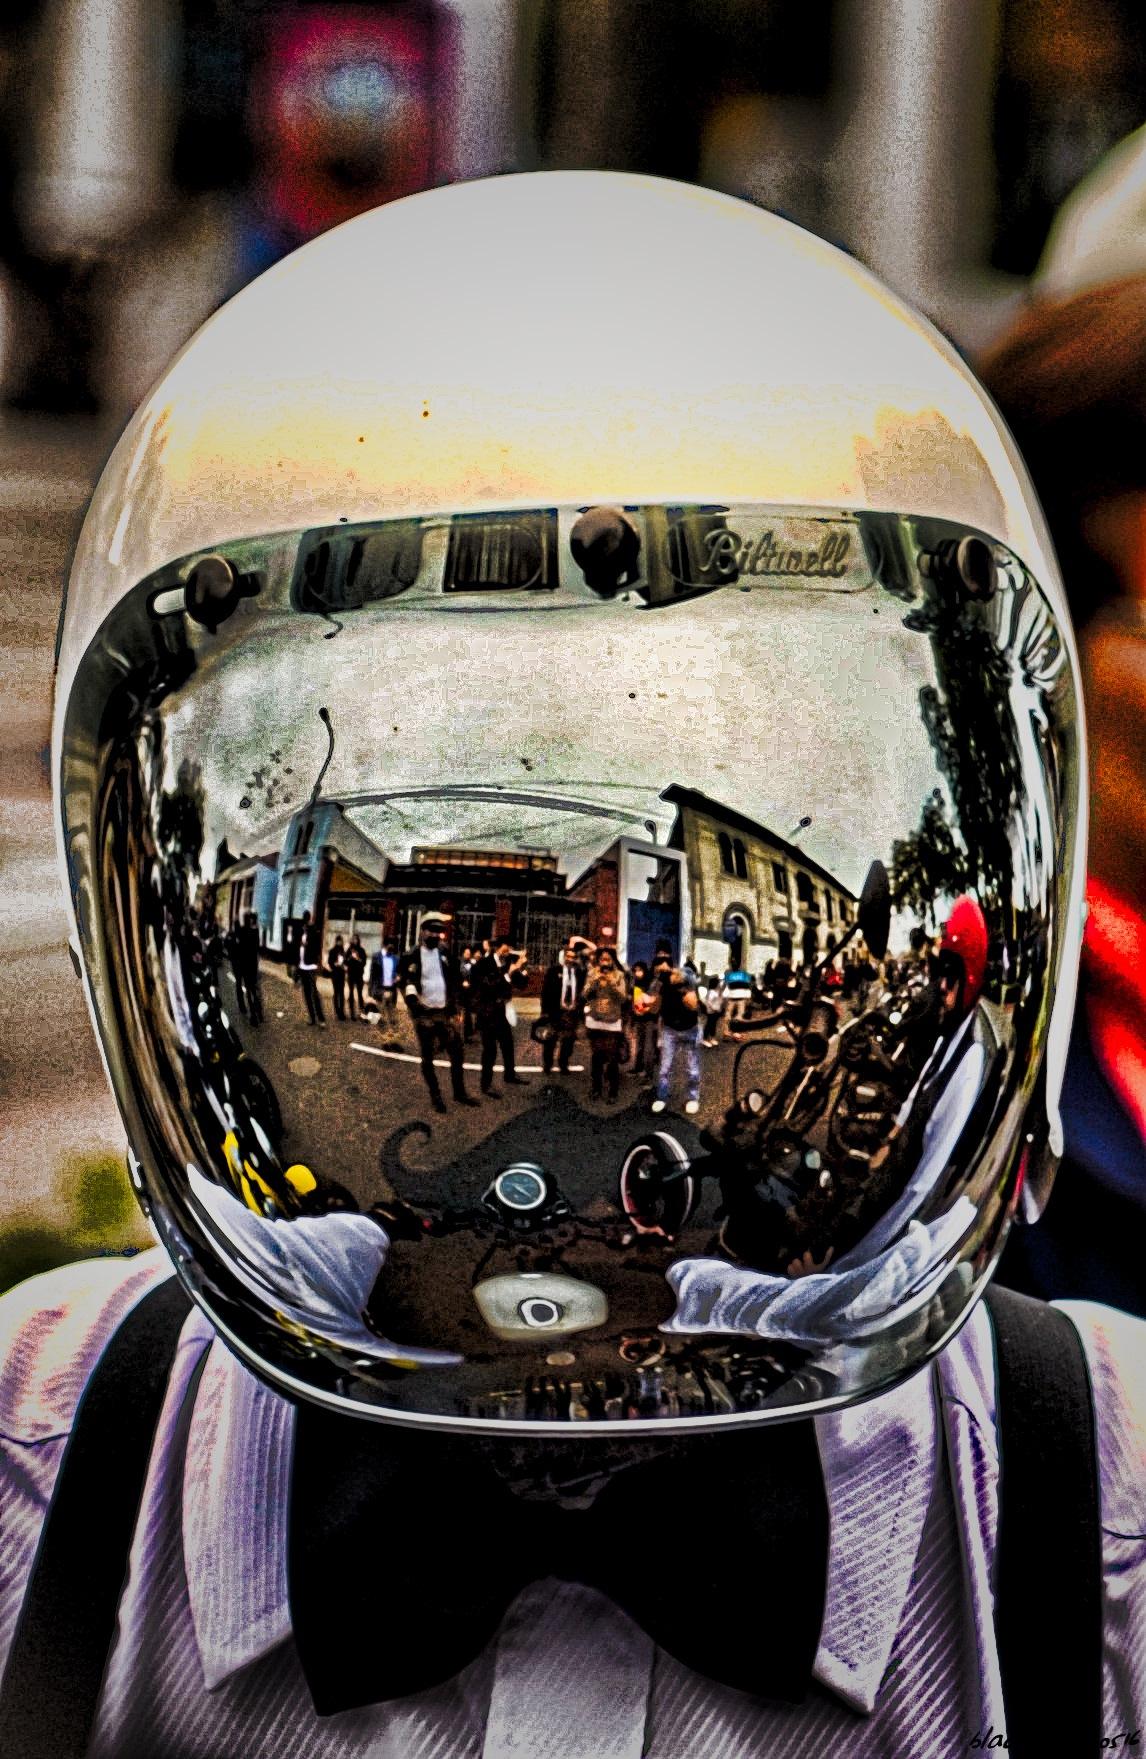 A Dapper Reflection by blackpixifotos